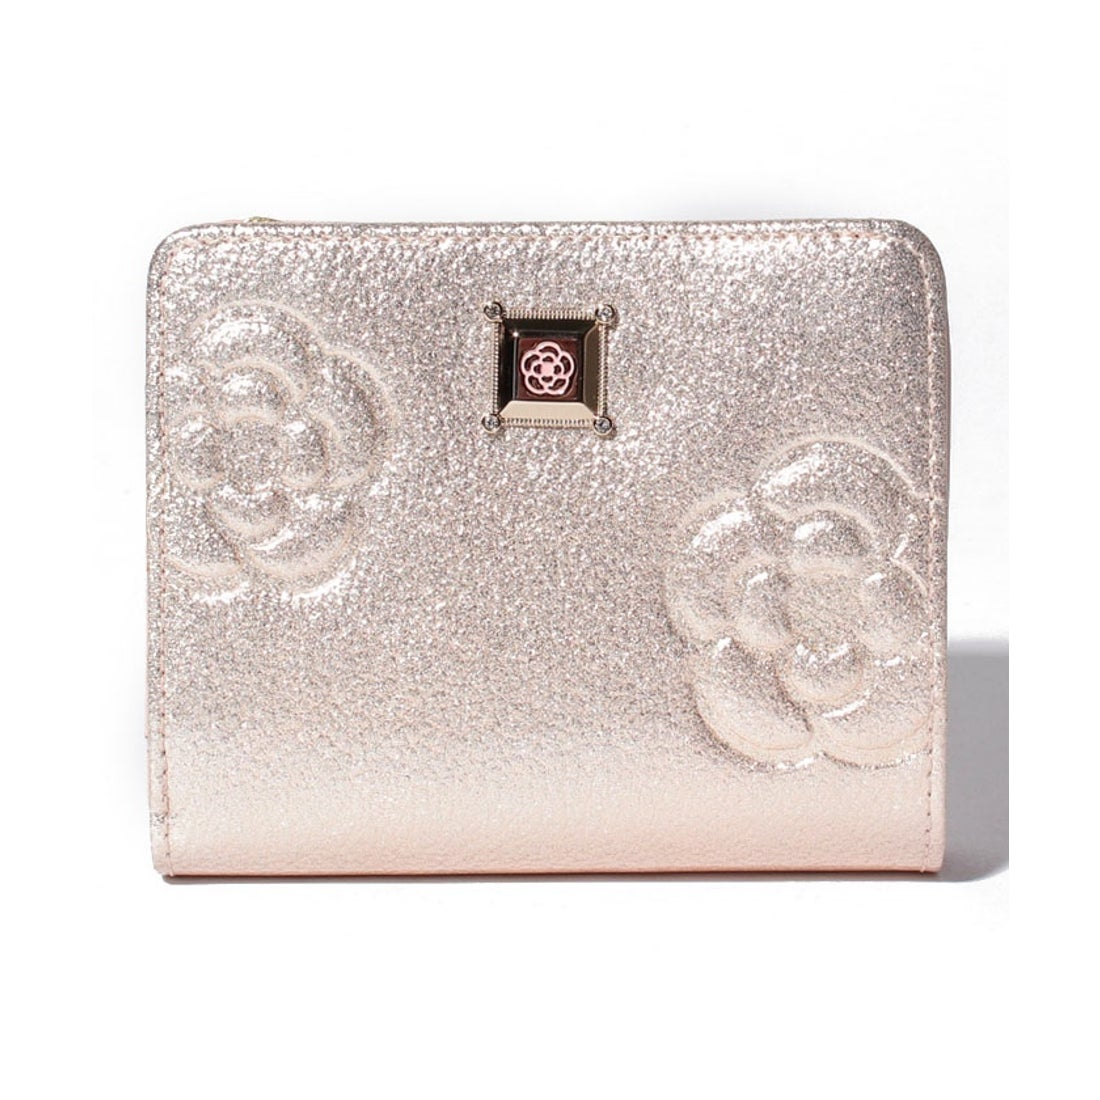 ba57e69da8f3 クレイサス CLATHAS マリーゴールド 2つ折り財布 (ピンク) -靴&ファッション通販 ロコンド〜自宅で試着、気軽に返品